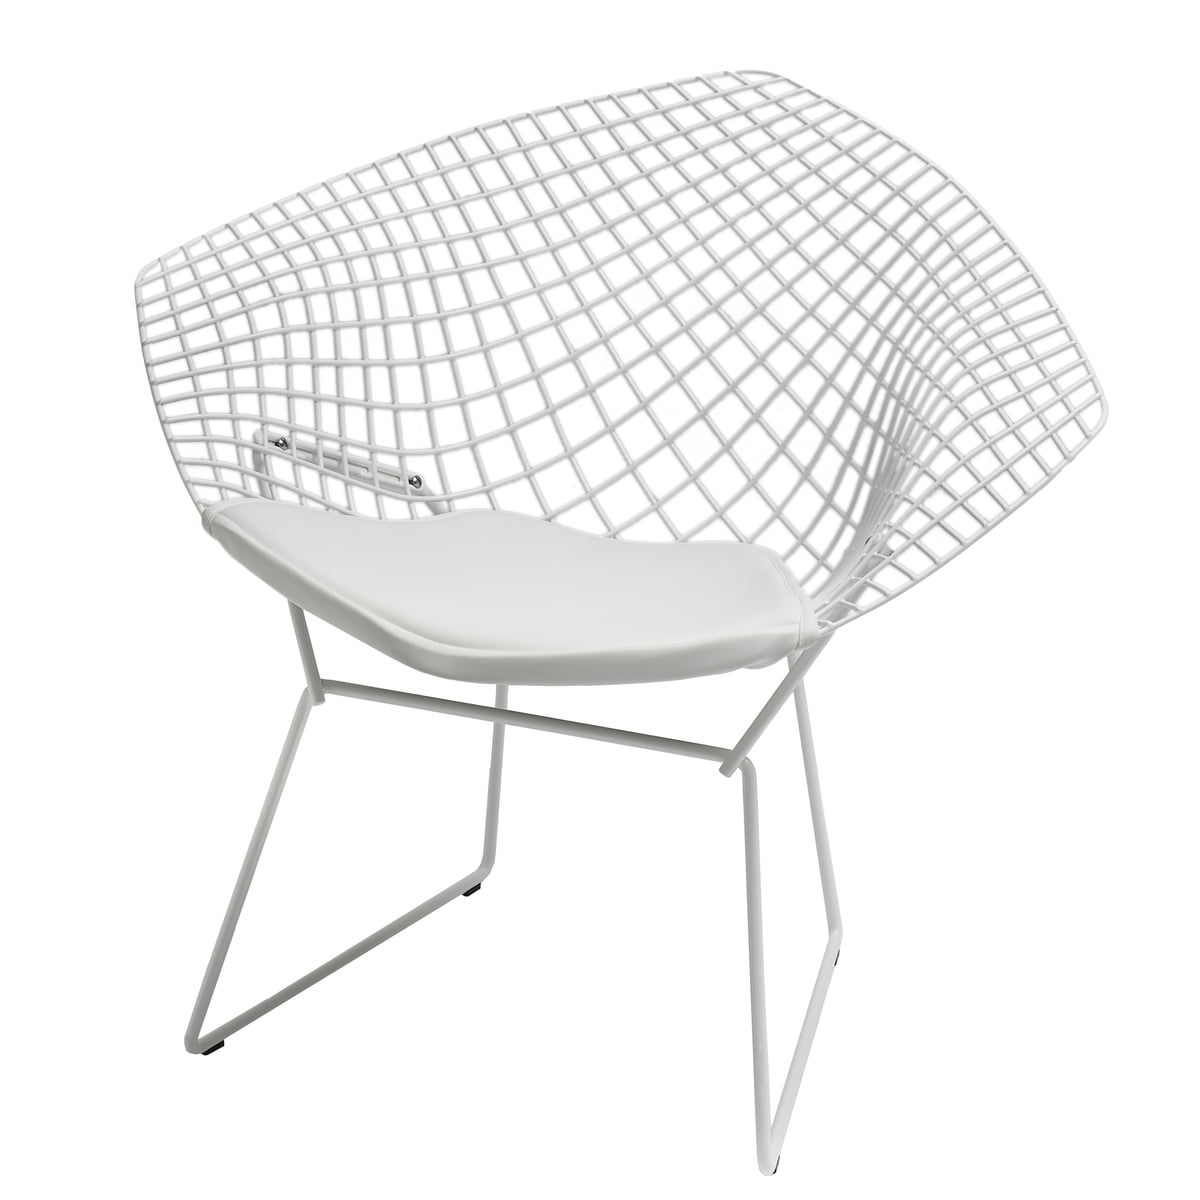 fauteuil bertoia diamond outdoor knoll. Black Bedroom Furniture Sets. Home Design Ideas